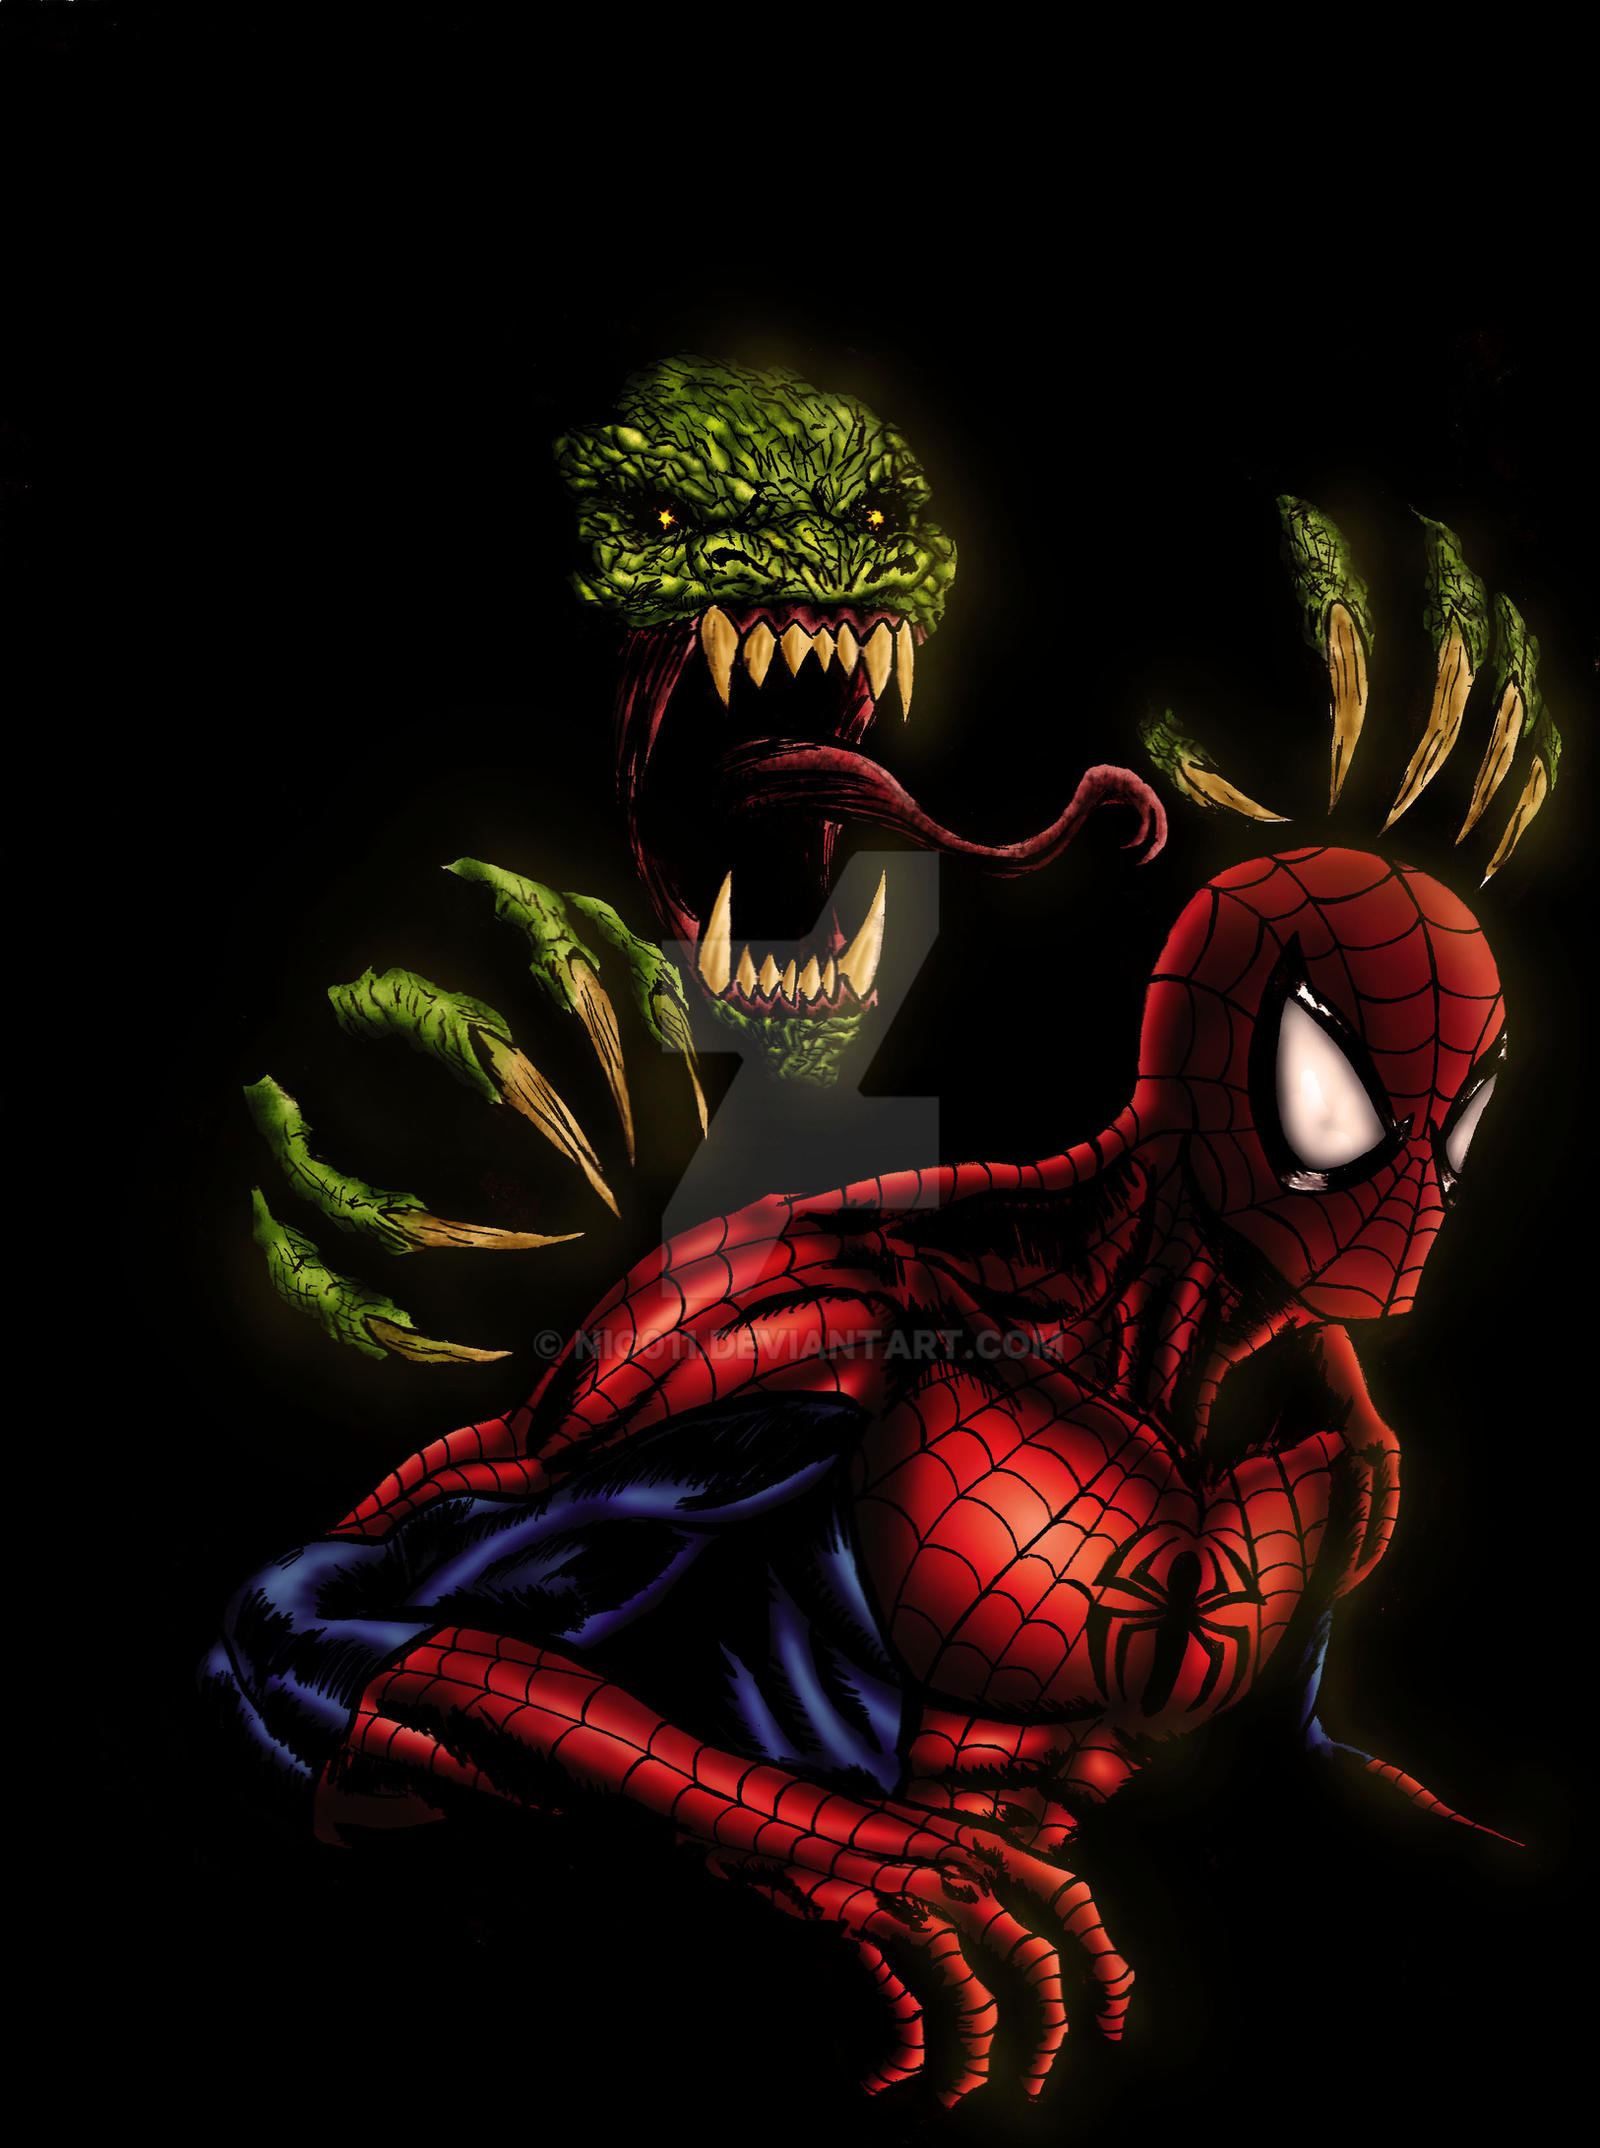 Spiderman Vs Lizard by nic011 on DeviantArt